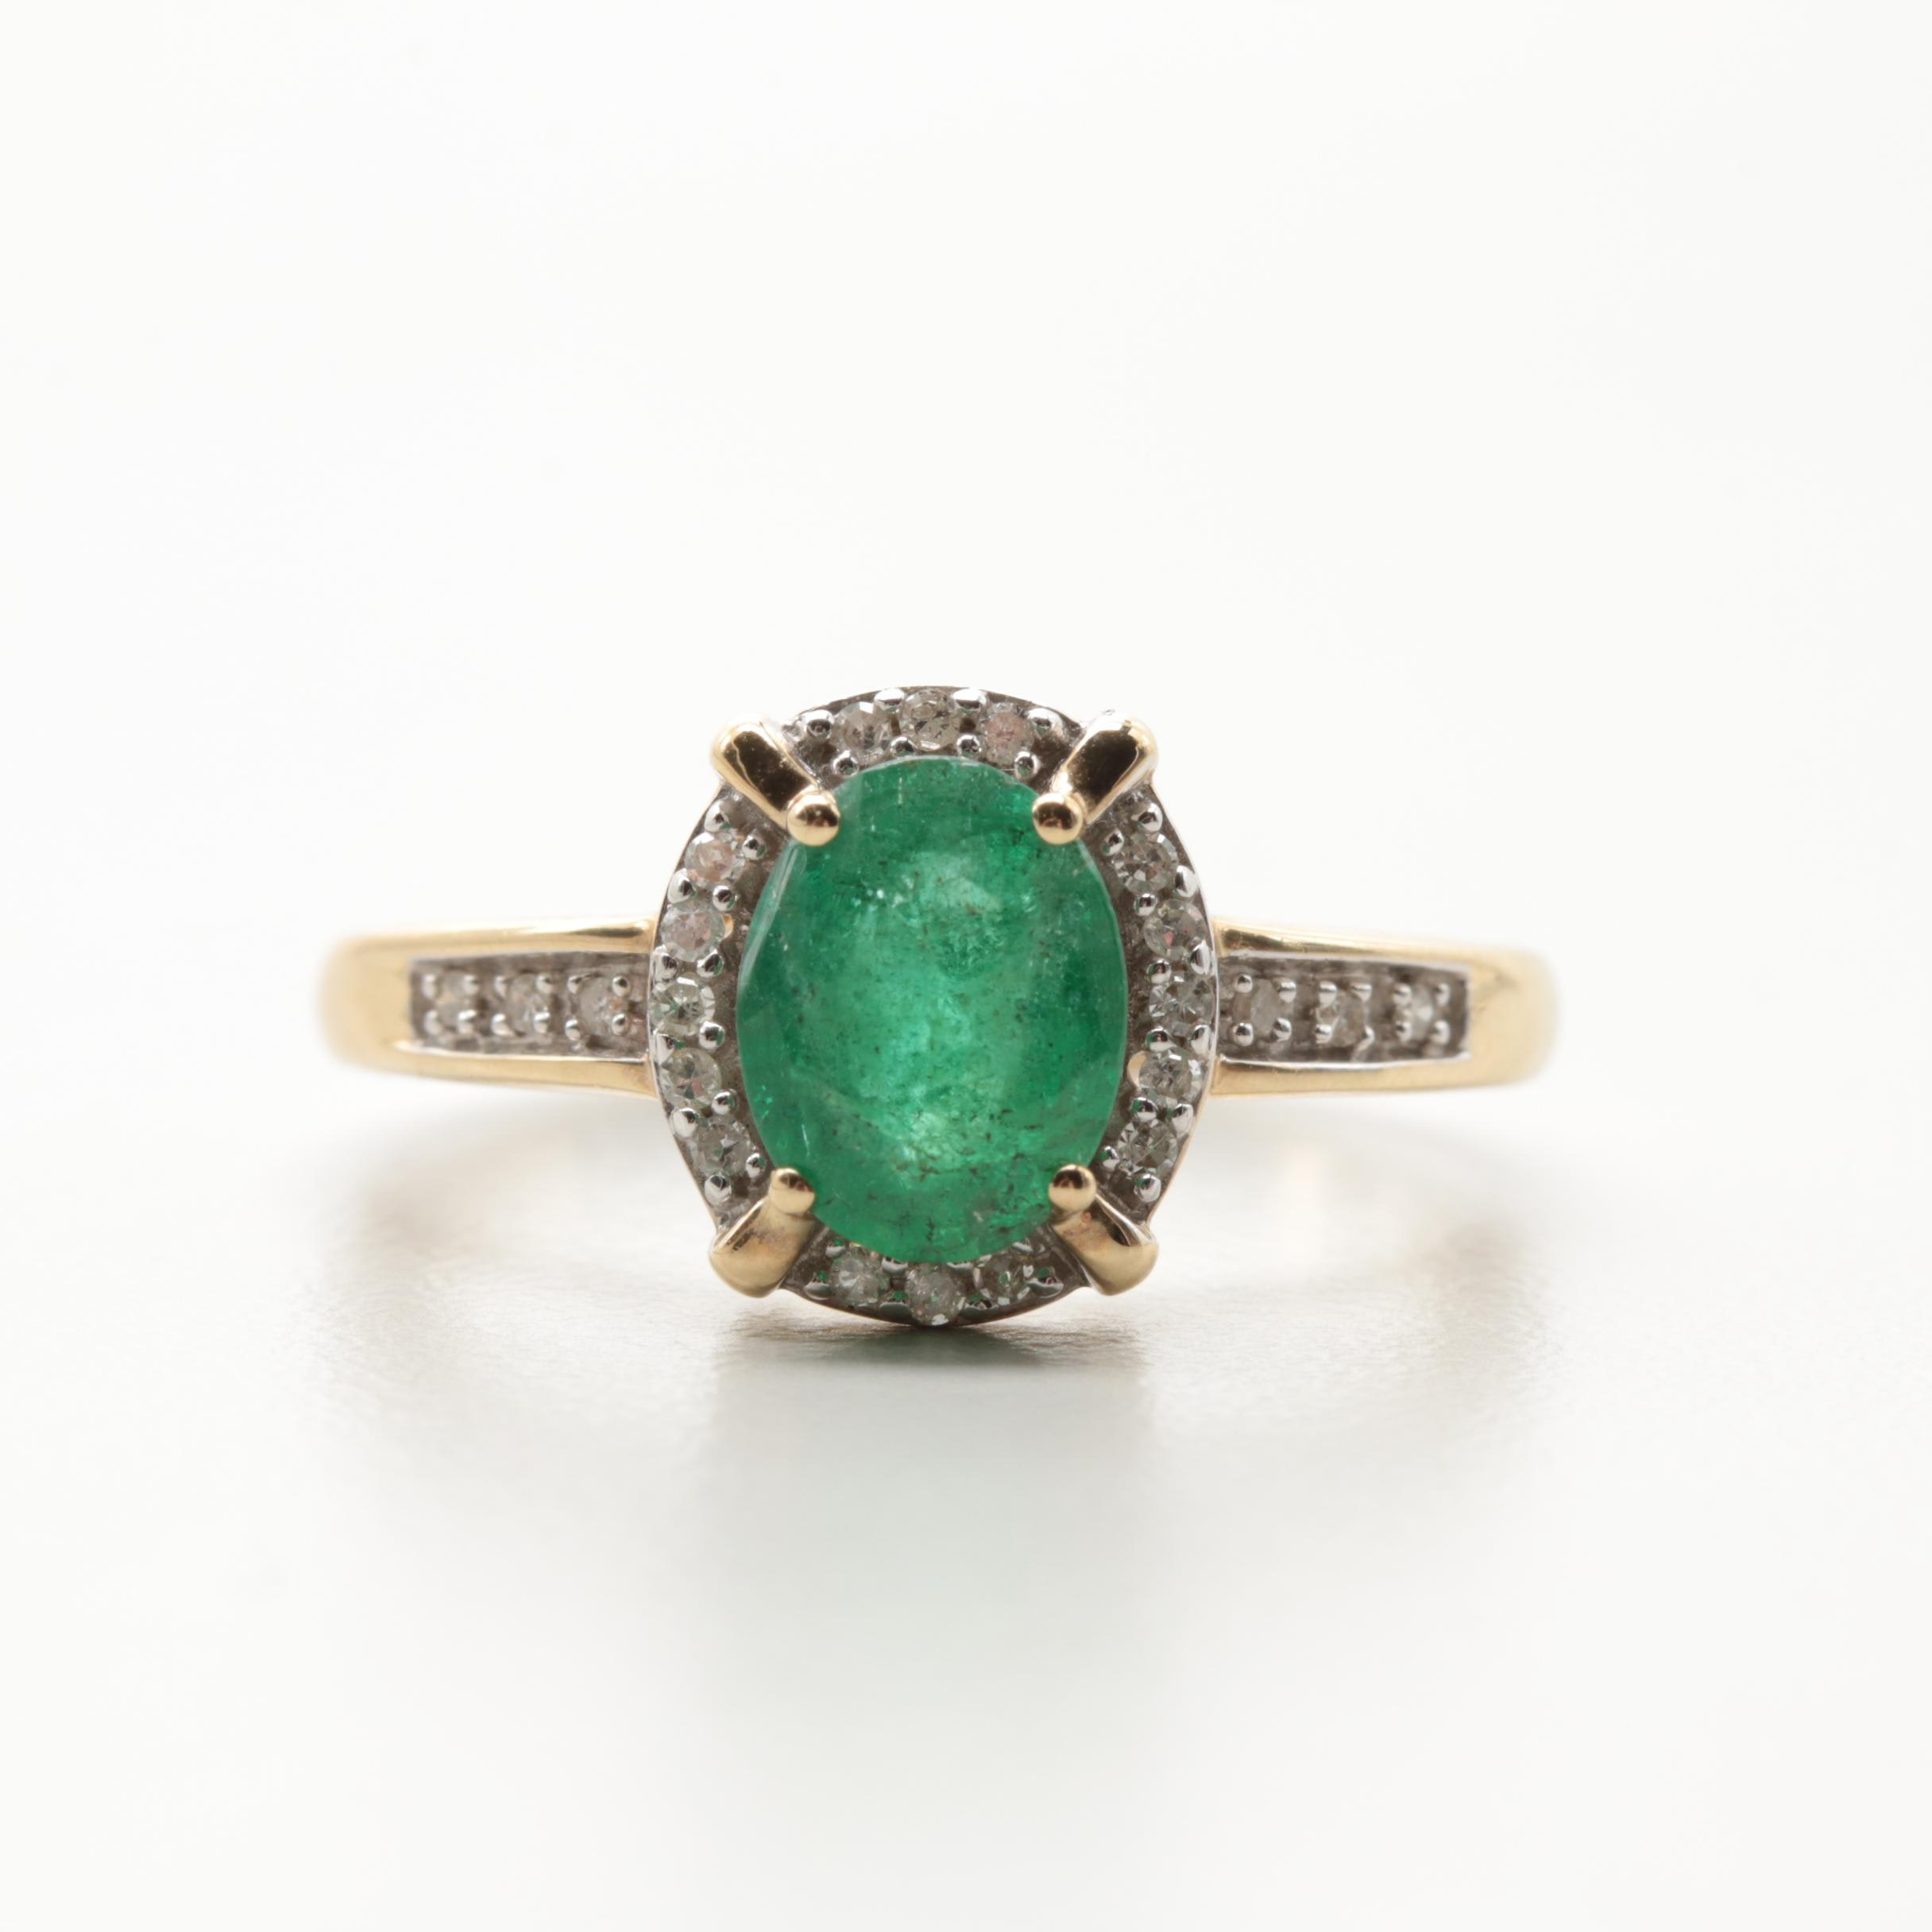 10K Yellow Gold 1.00 CT Emerald and Diamond Ring